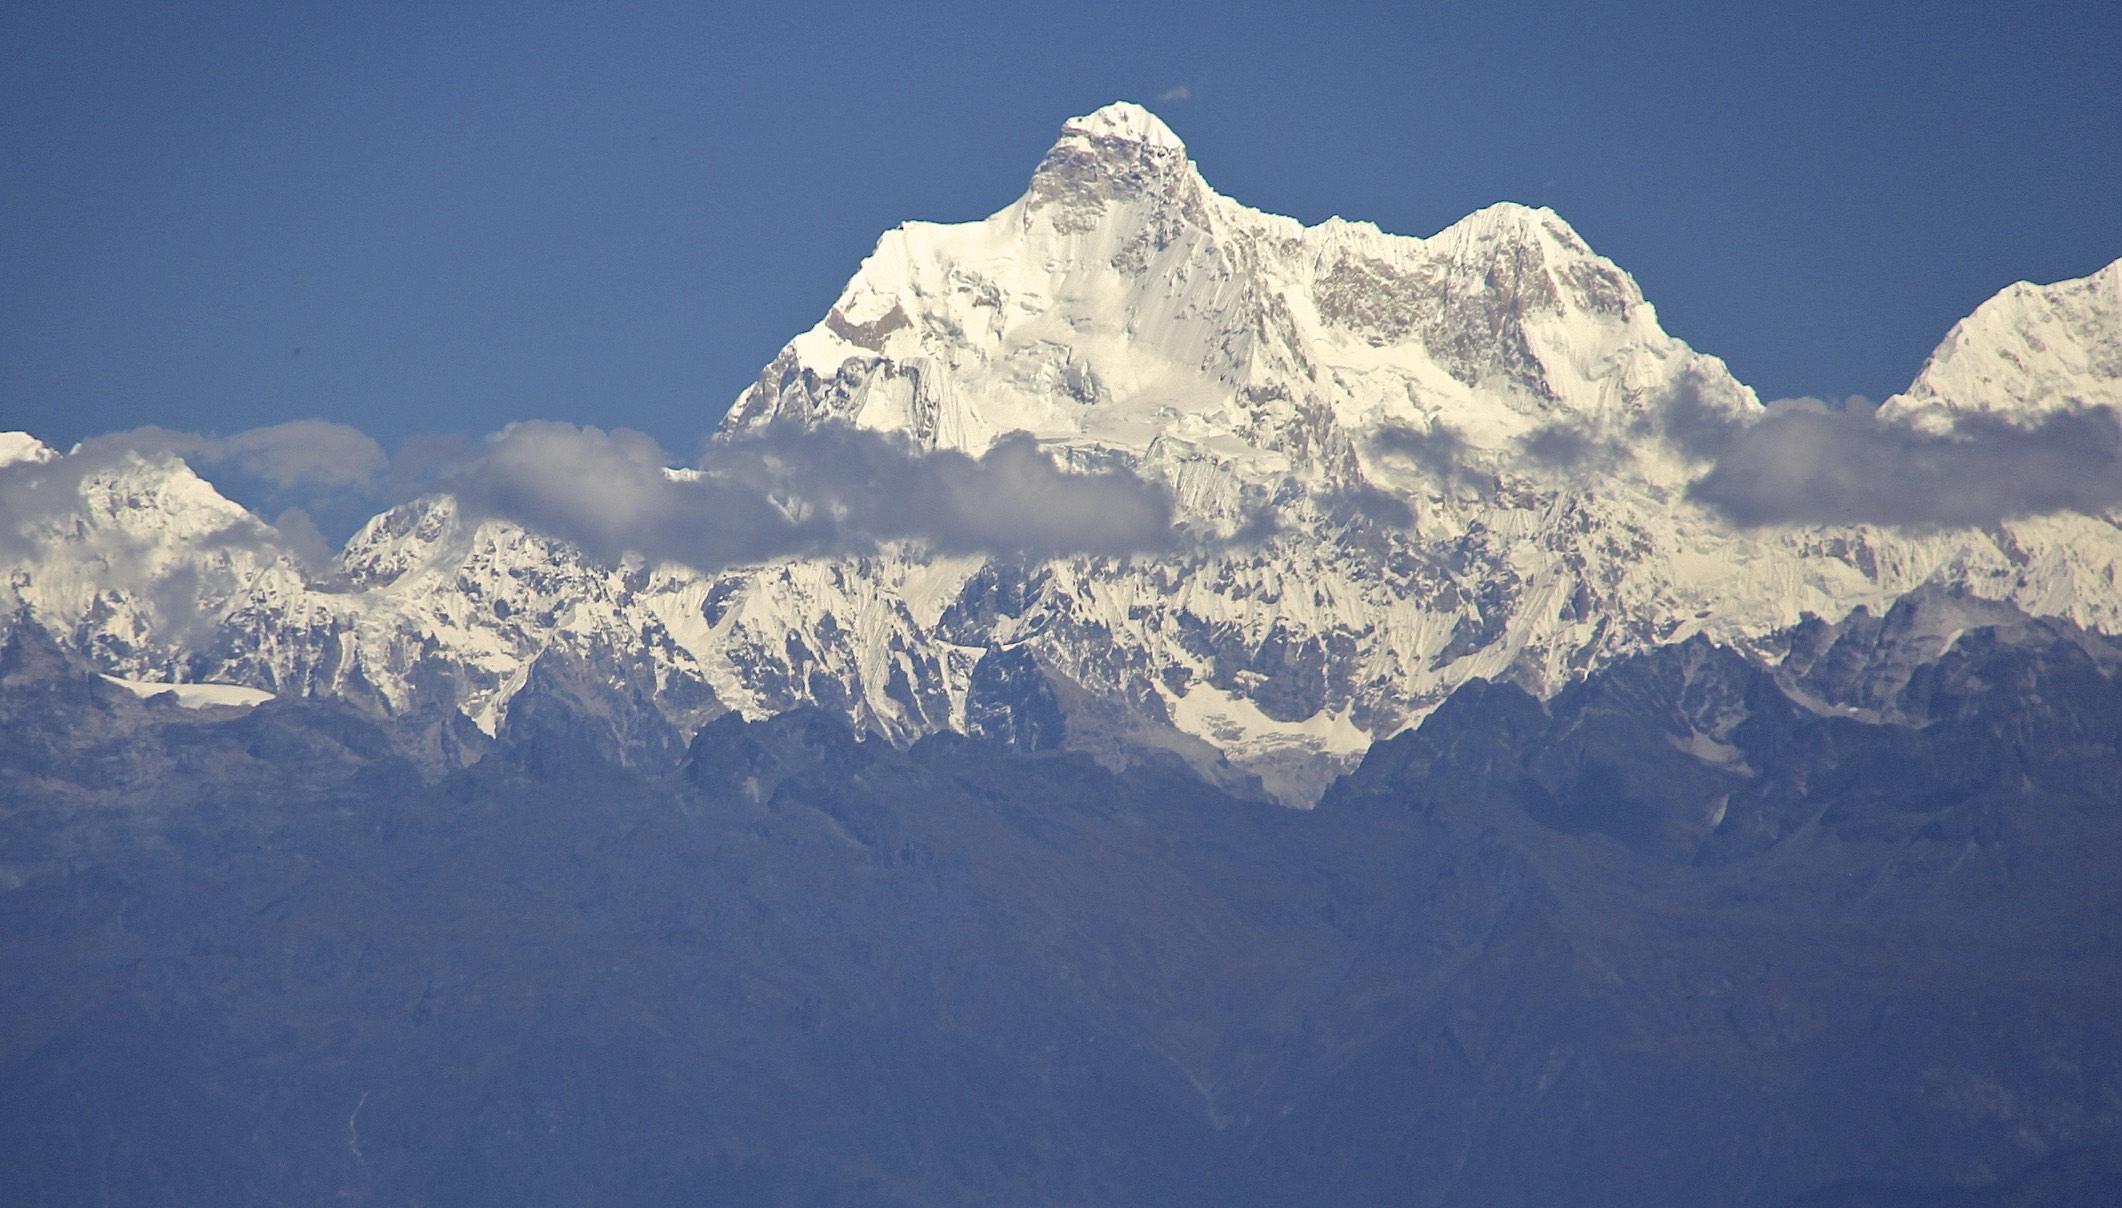 Jannu Peak from Ilam - the spectacular Kangchendzonga massif